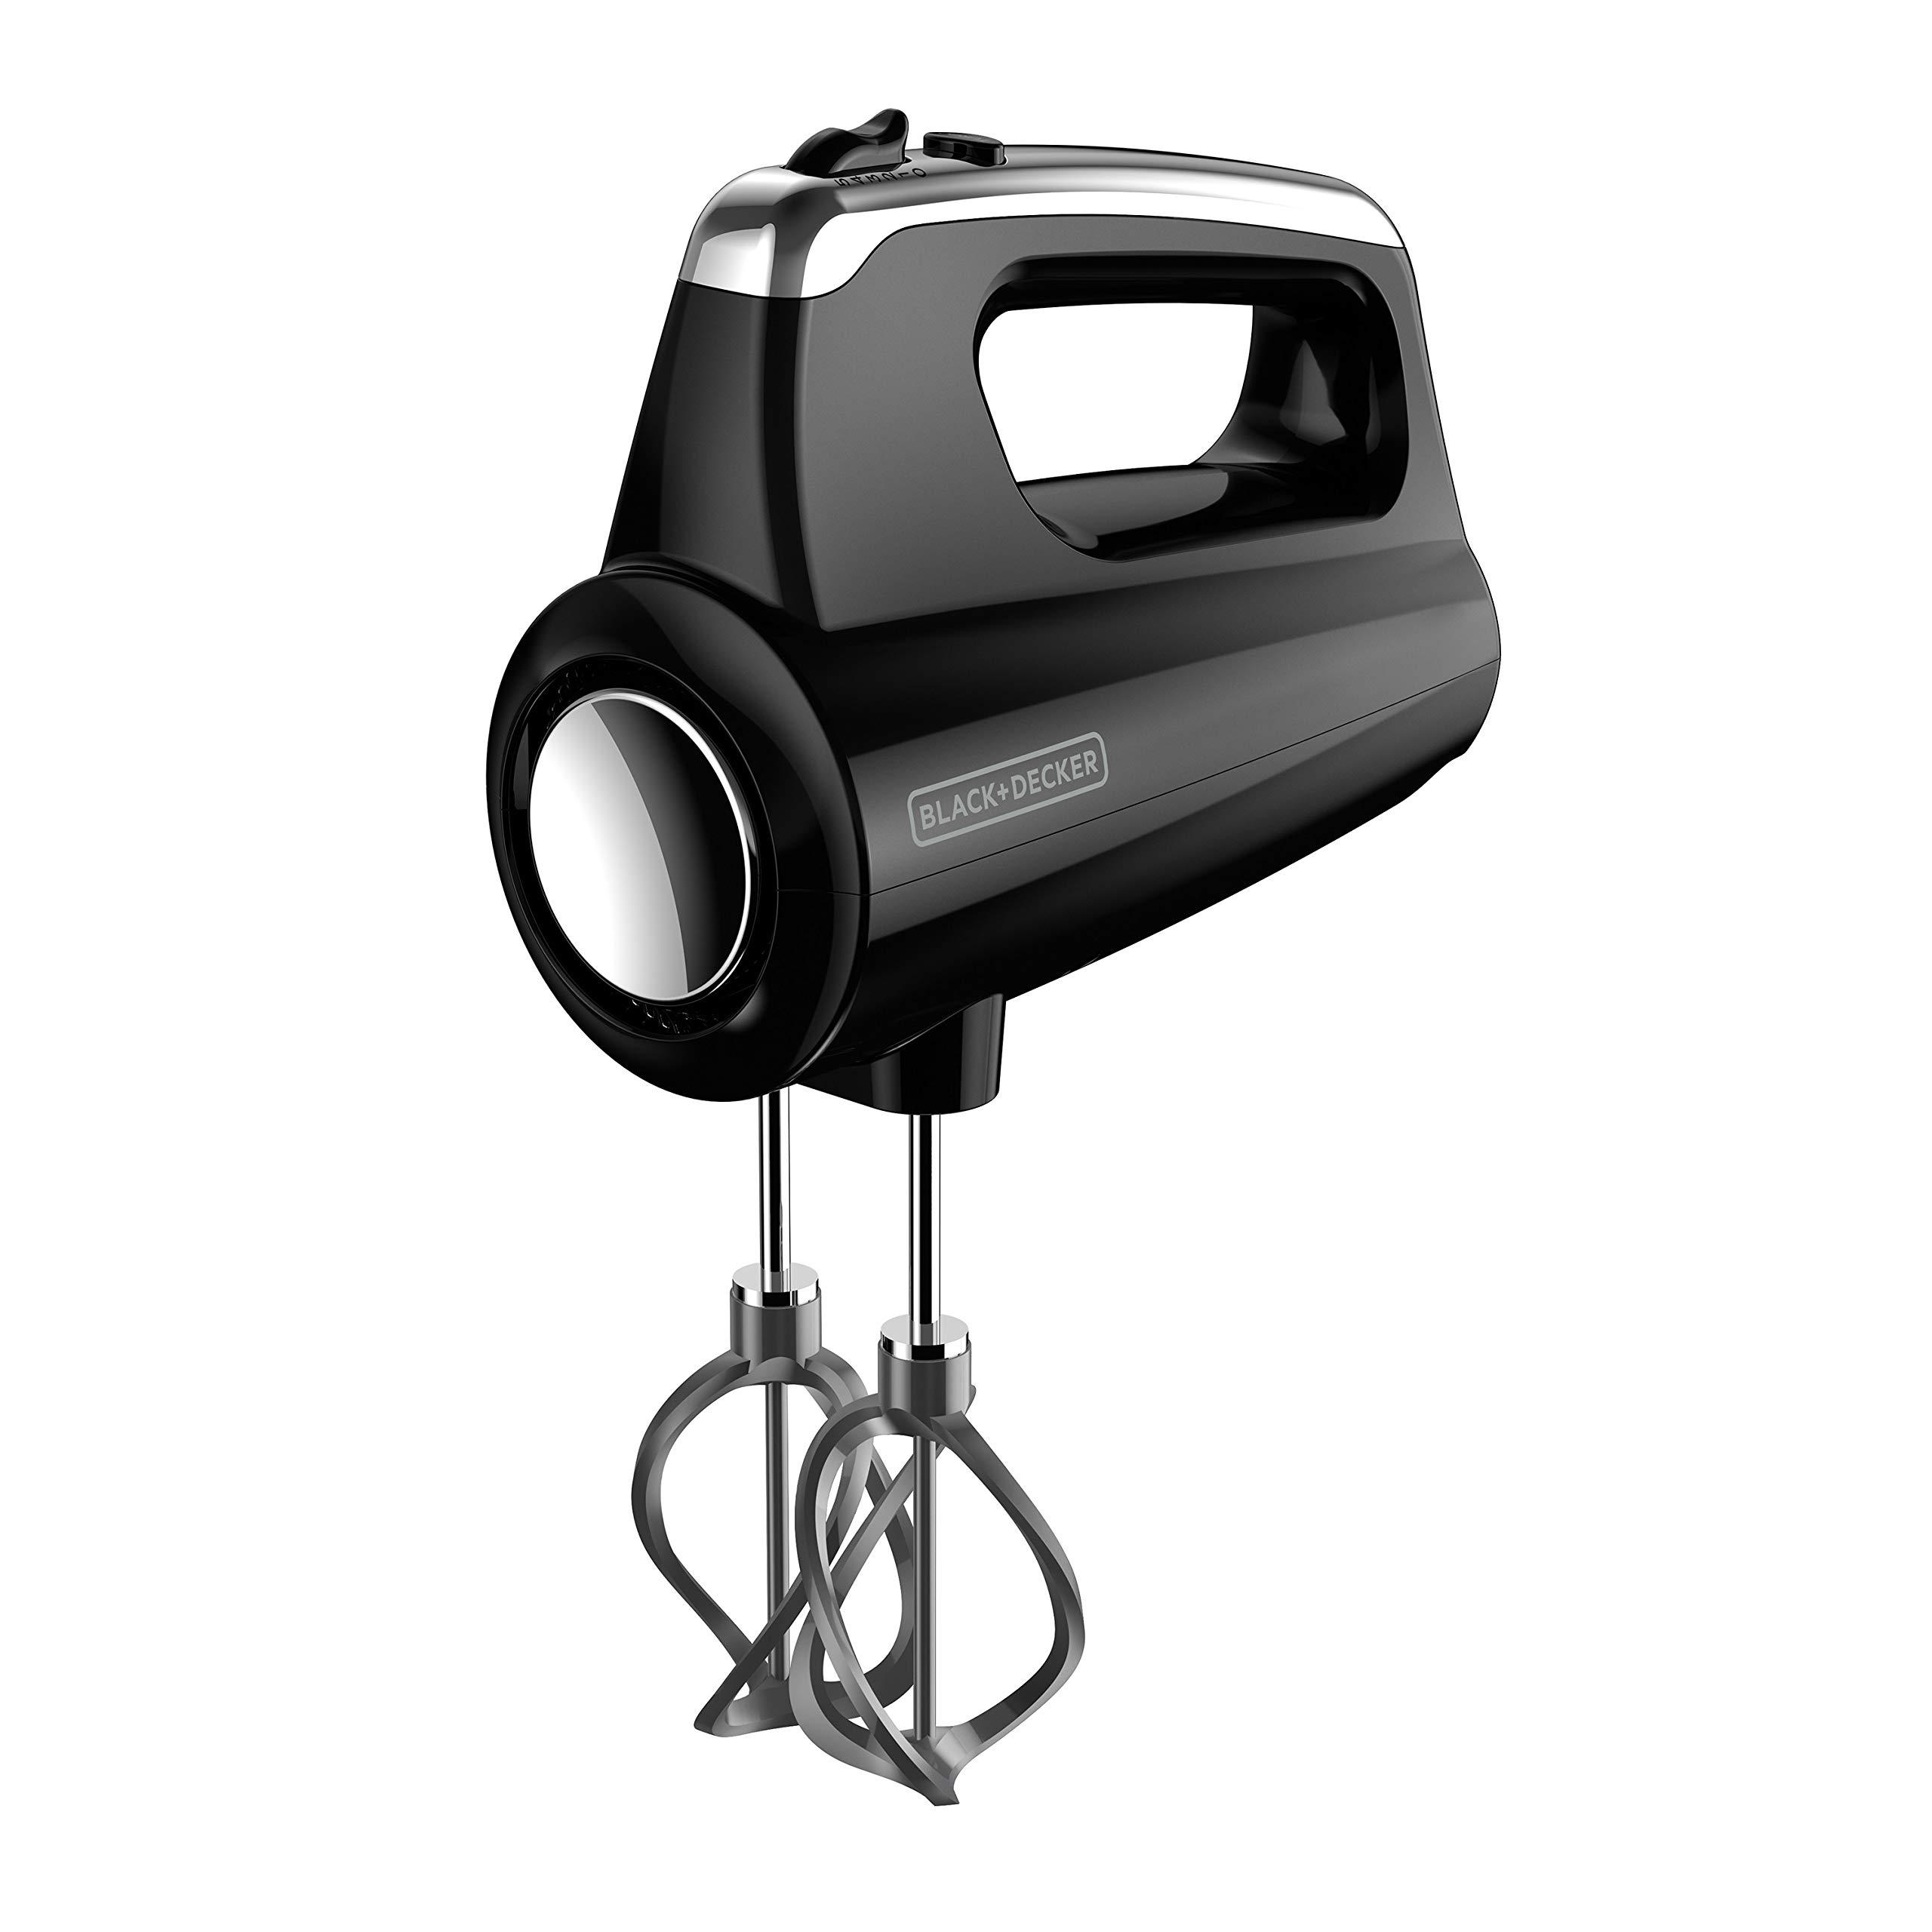 BLACK+DECKER MX600B Helix Performance Premium 5-Speed Hand Mixer